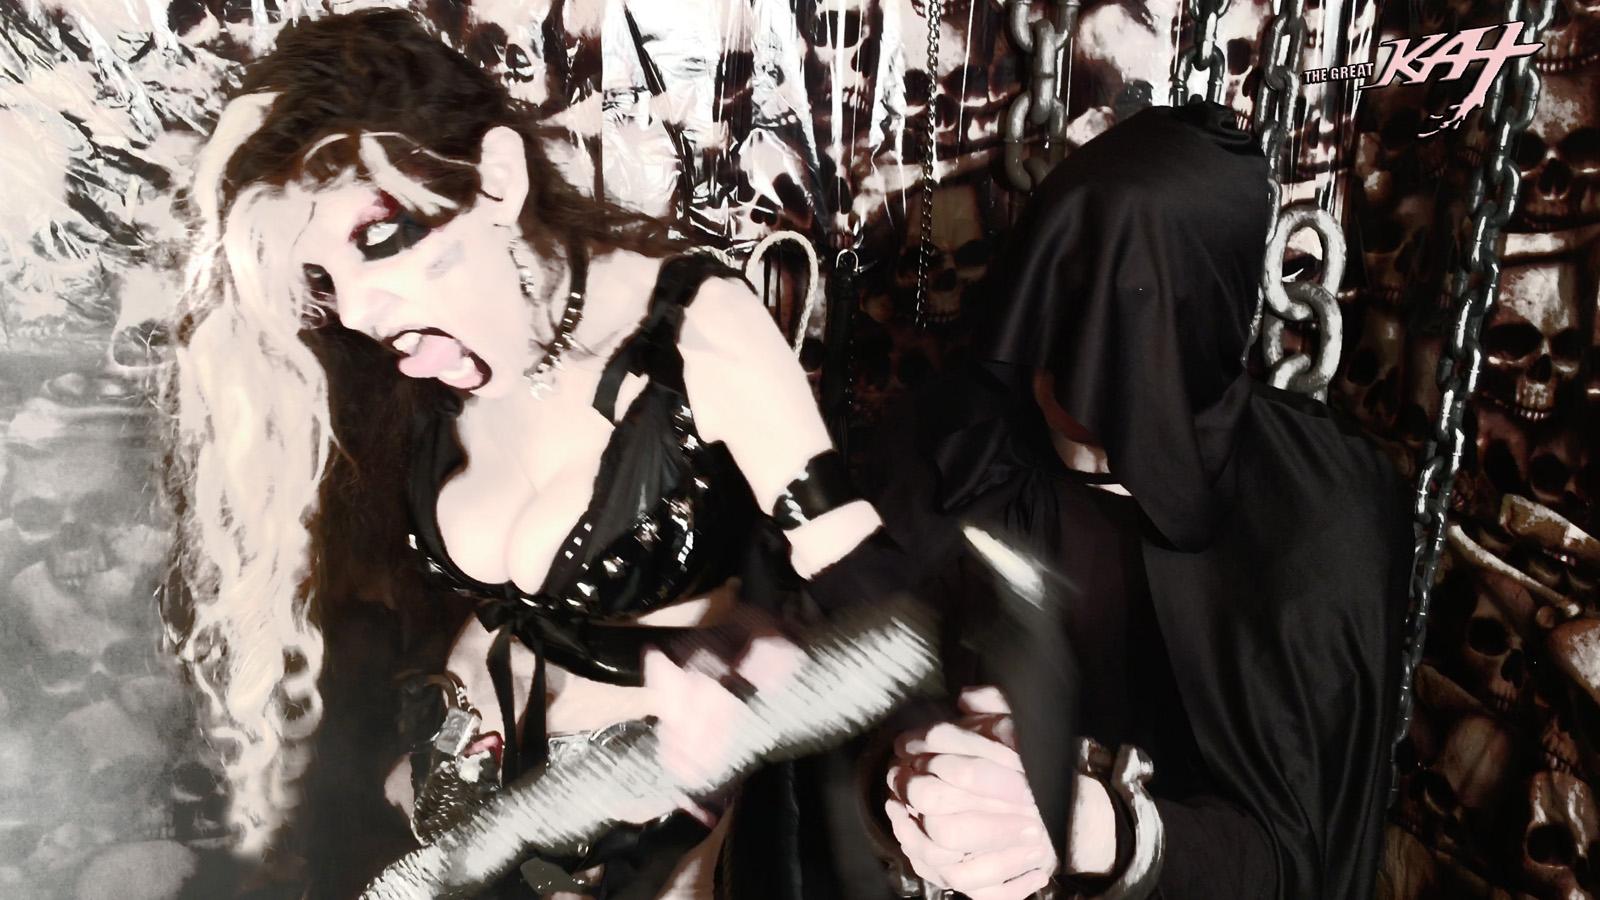 "BRUTAL, EVIL MISTRESS KAT! From The Great Kat's LISZT'S ""HUNGARIAN RHAPSODY #2"" MUSIC VIDEO!"